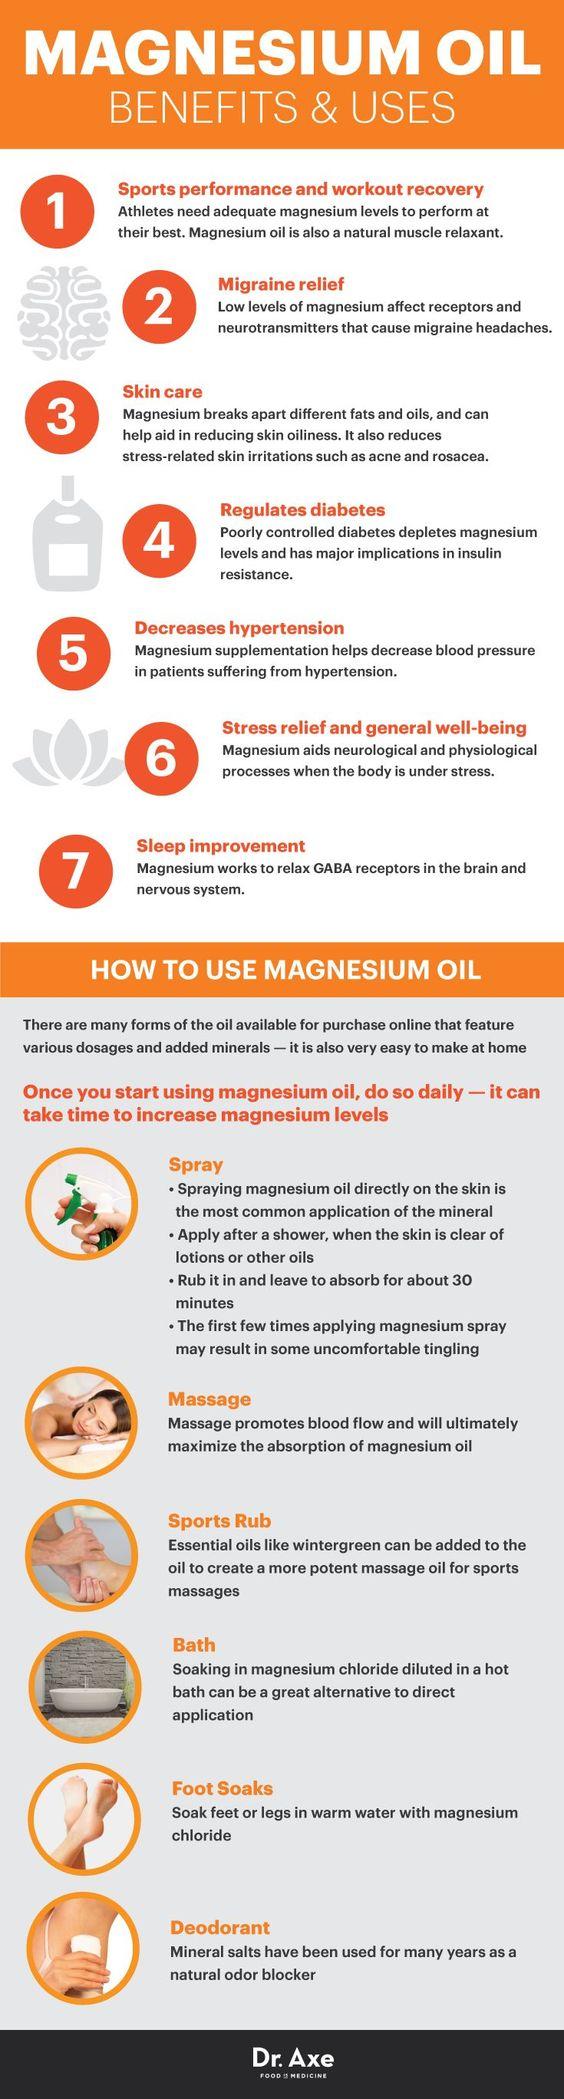 Benefits of Magnesium oil